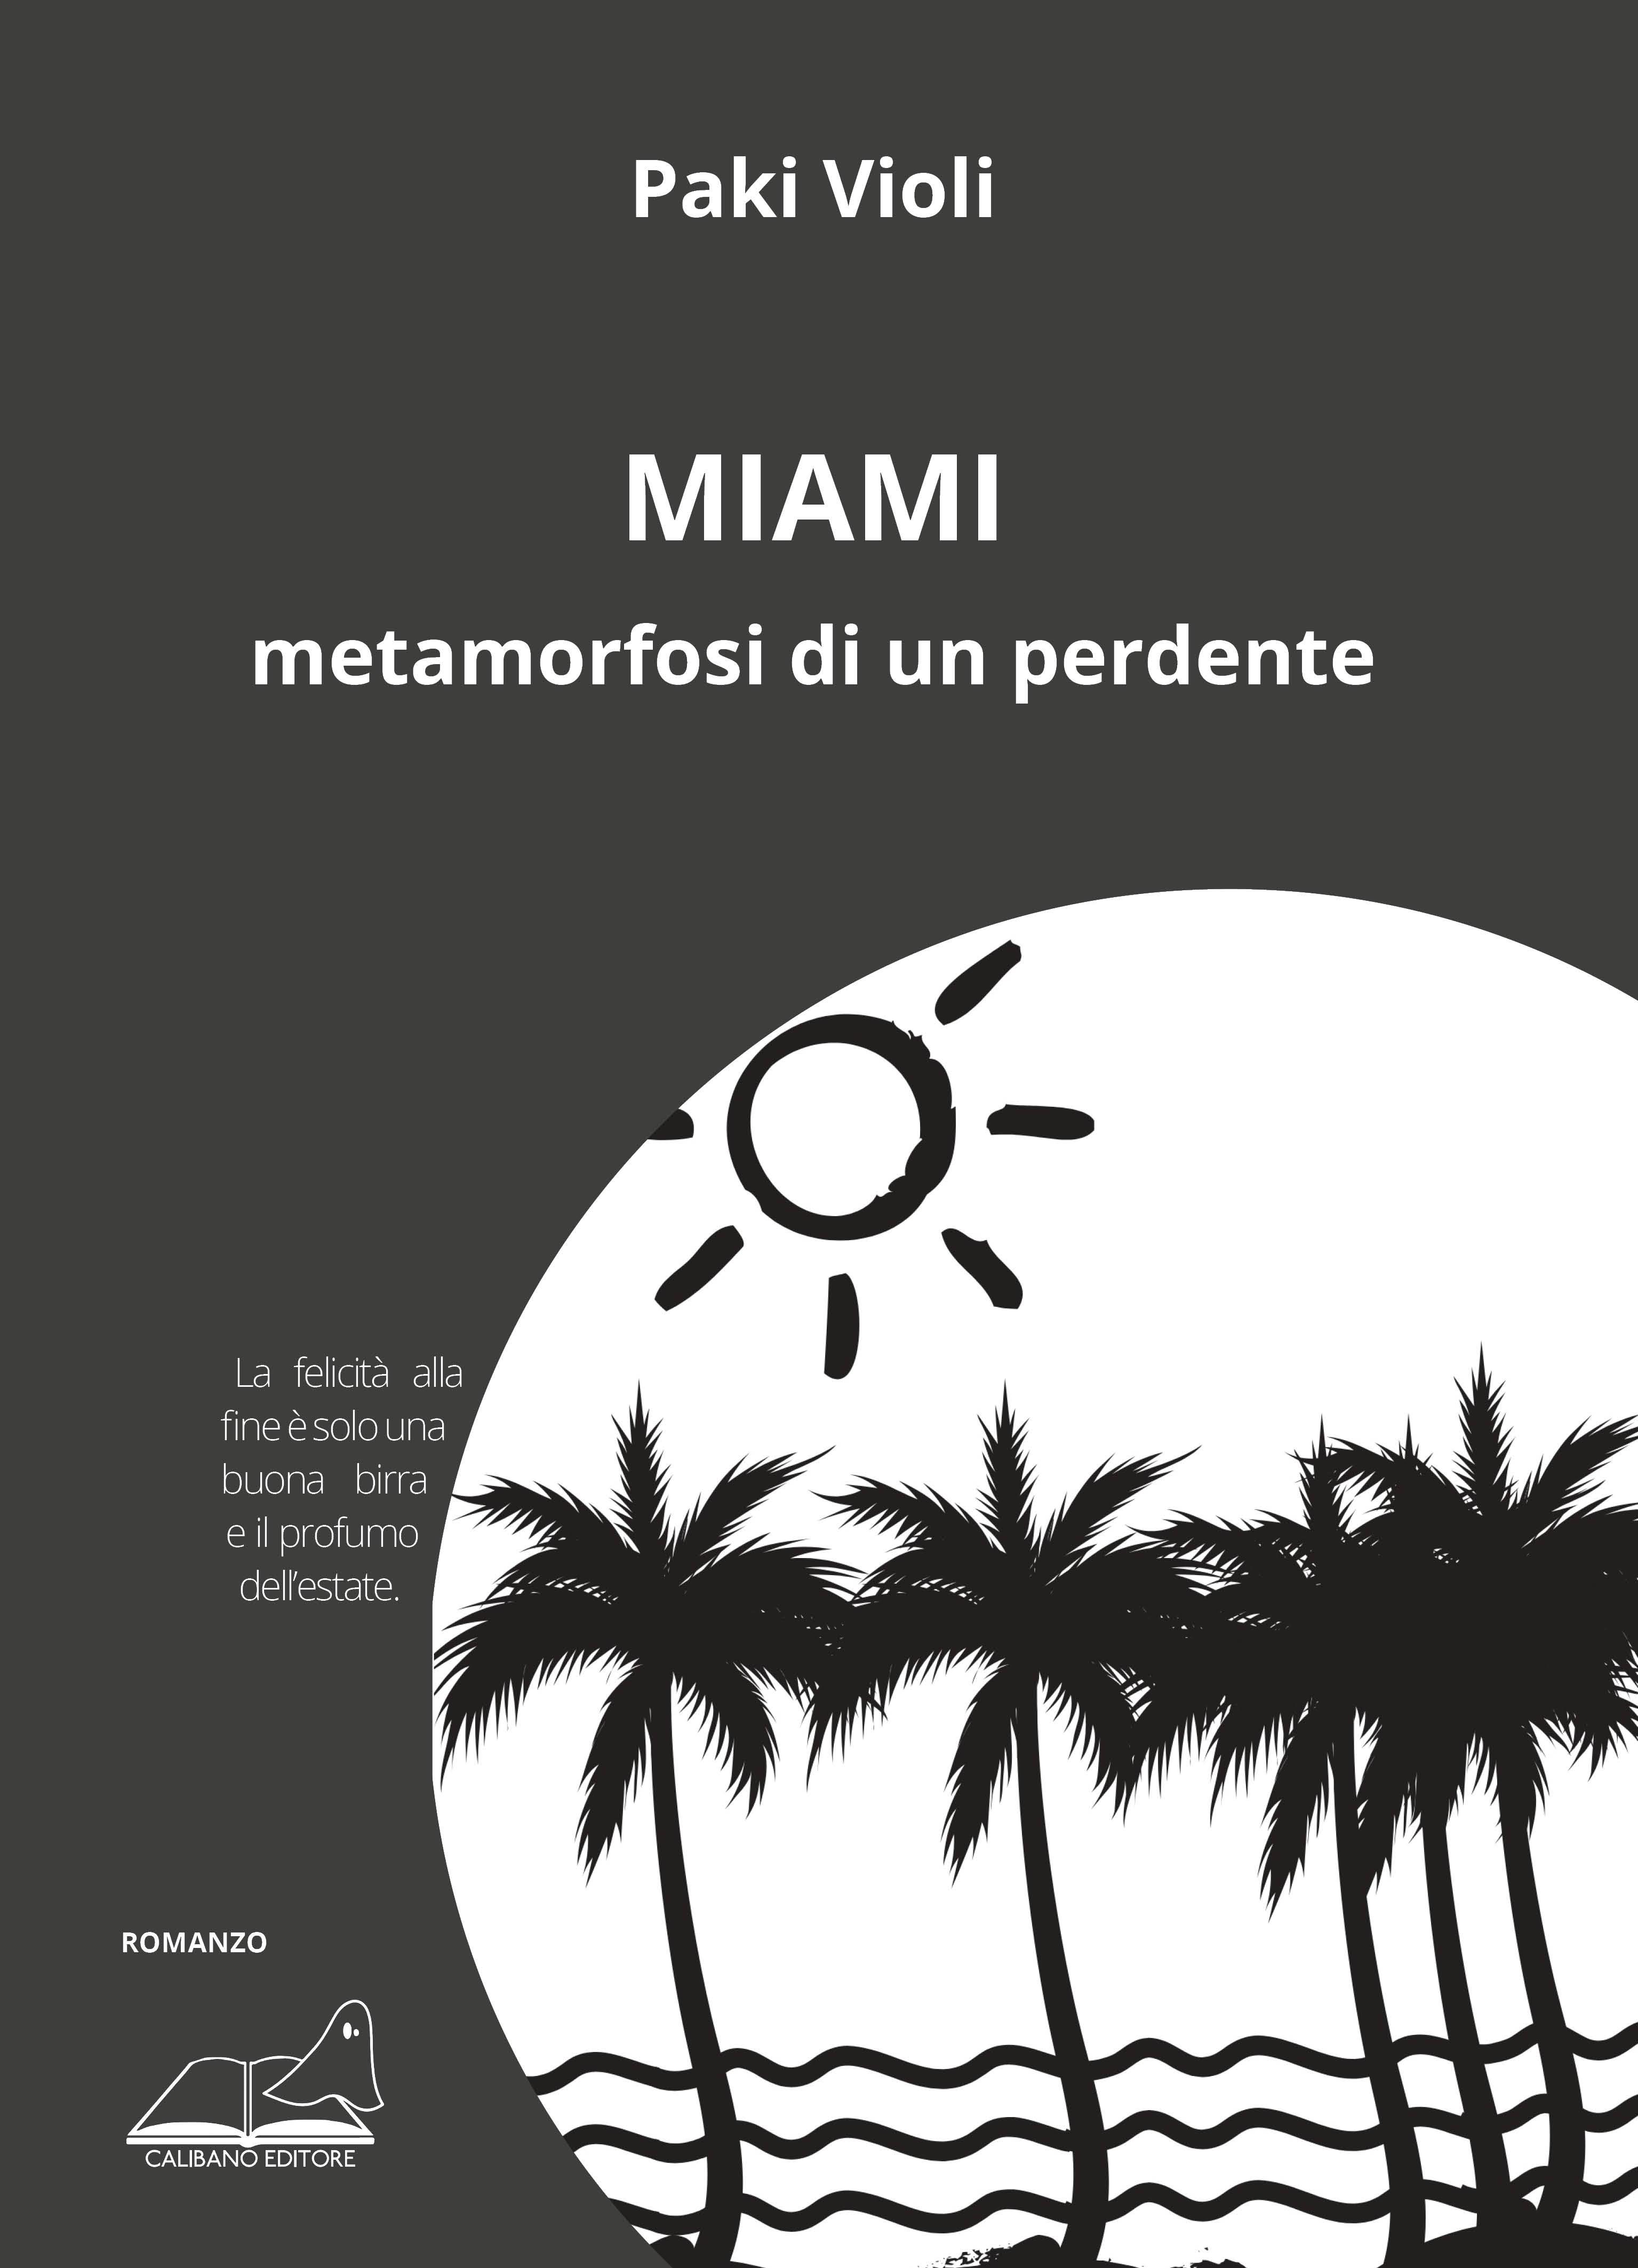 Miami-image-1%>